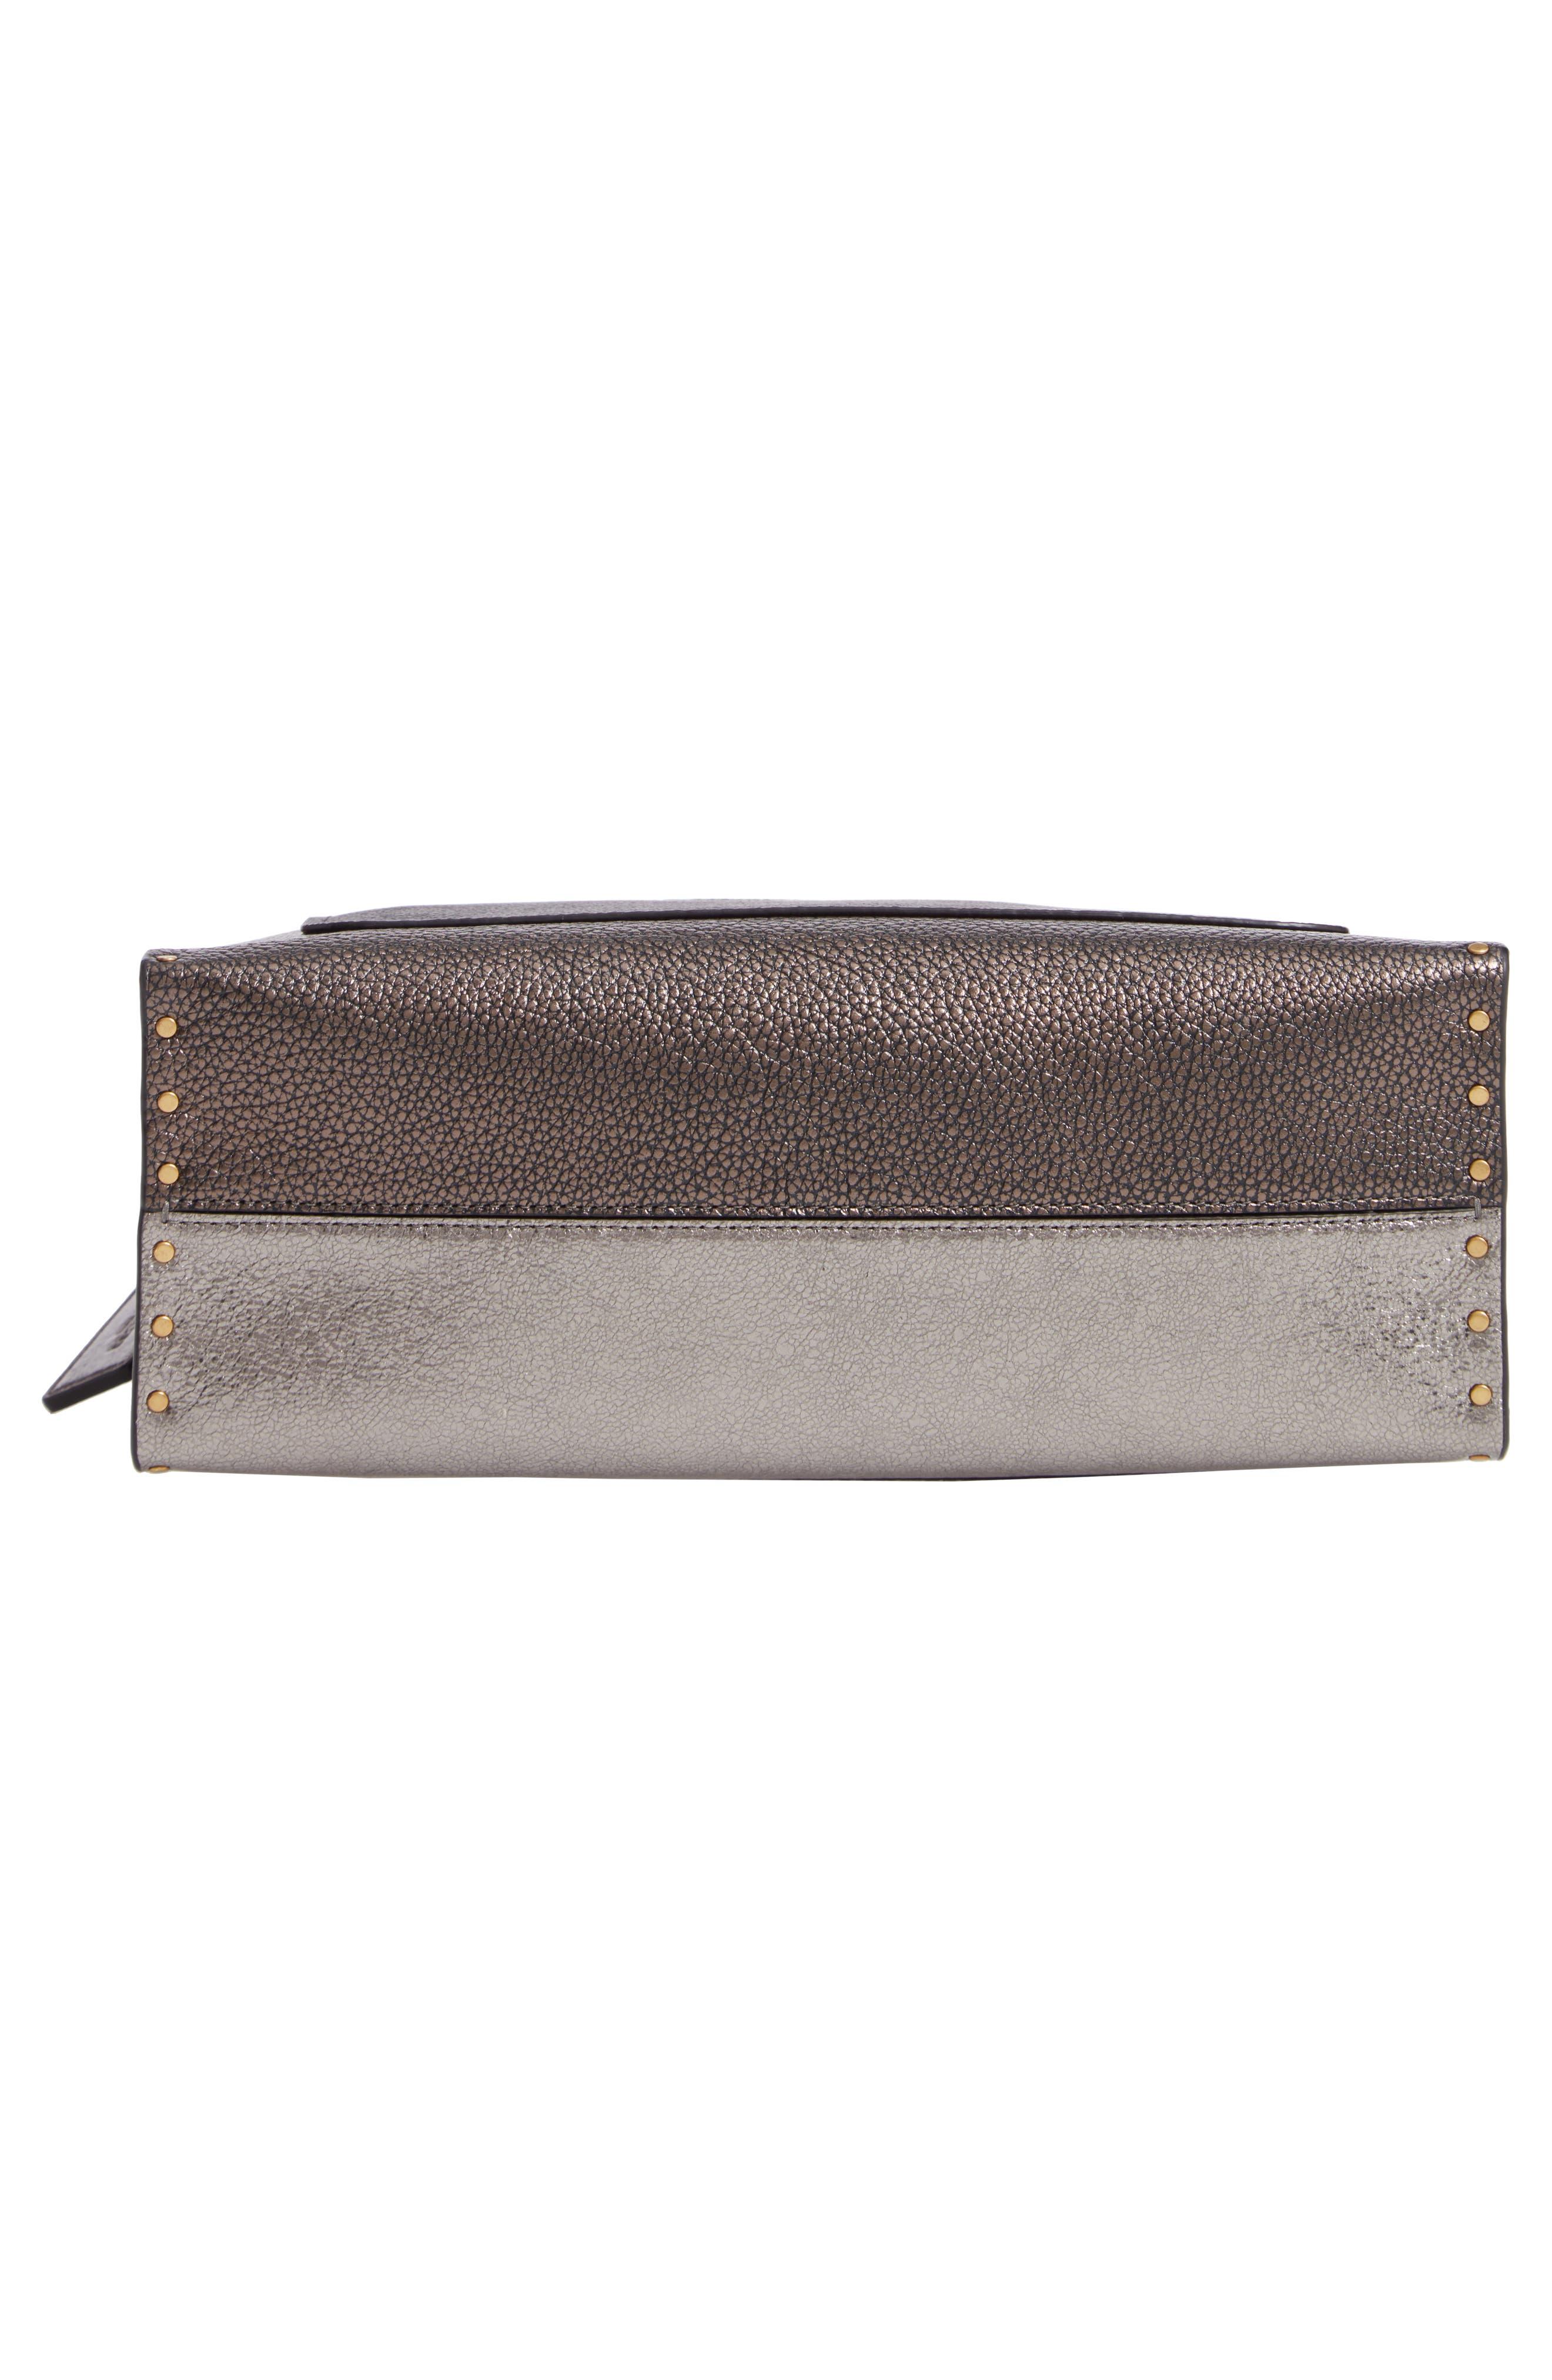 Signature Border Parker Leather & Genuine Snakeskin Shoulder Bag,                             Alternate thumbnail 6, color,                             CHARCOAL METALLIC GRAPHITE